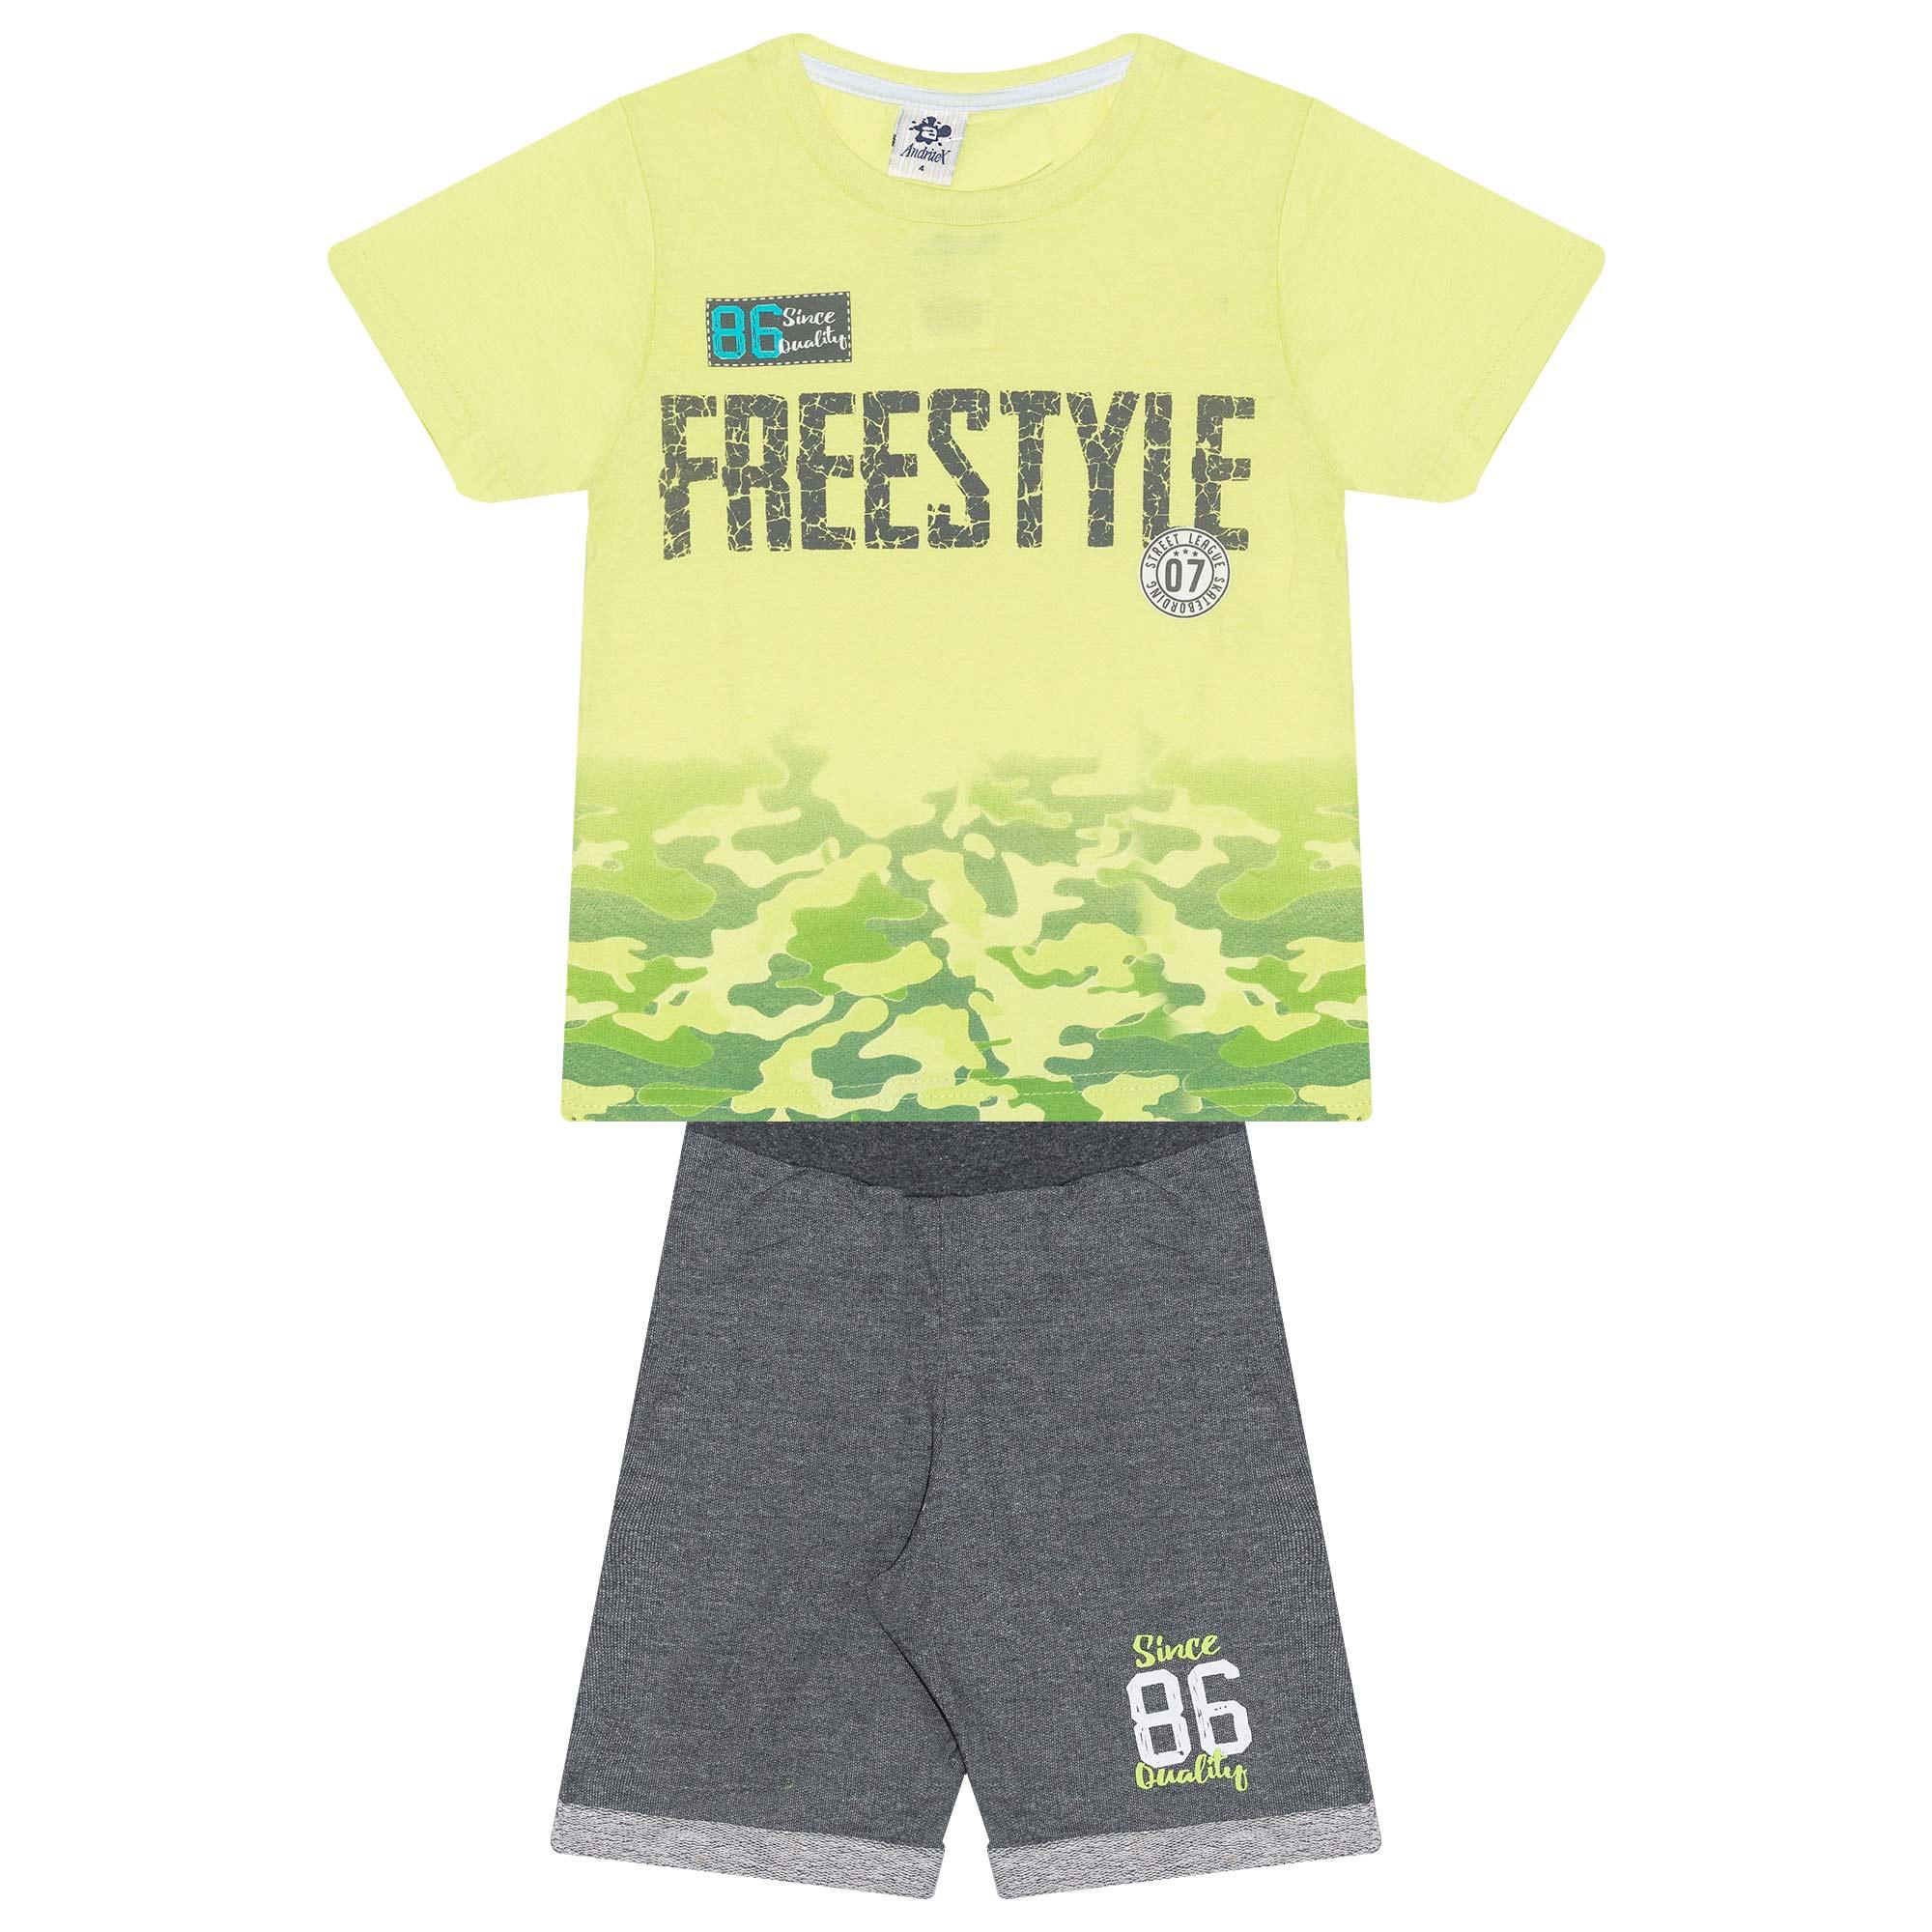 Conjunto Infantil Masculino - Ref 4775  - Verde - Andritex